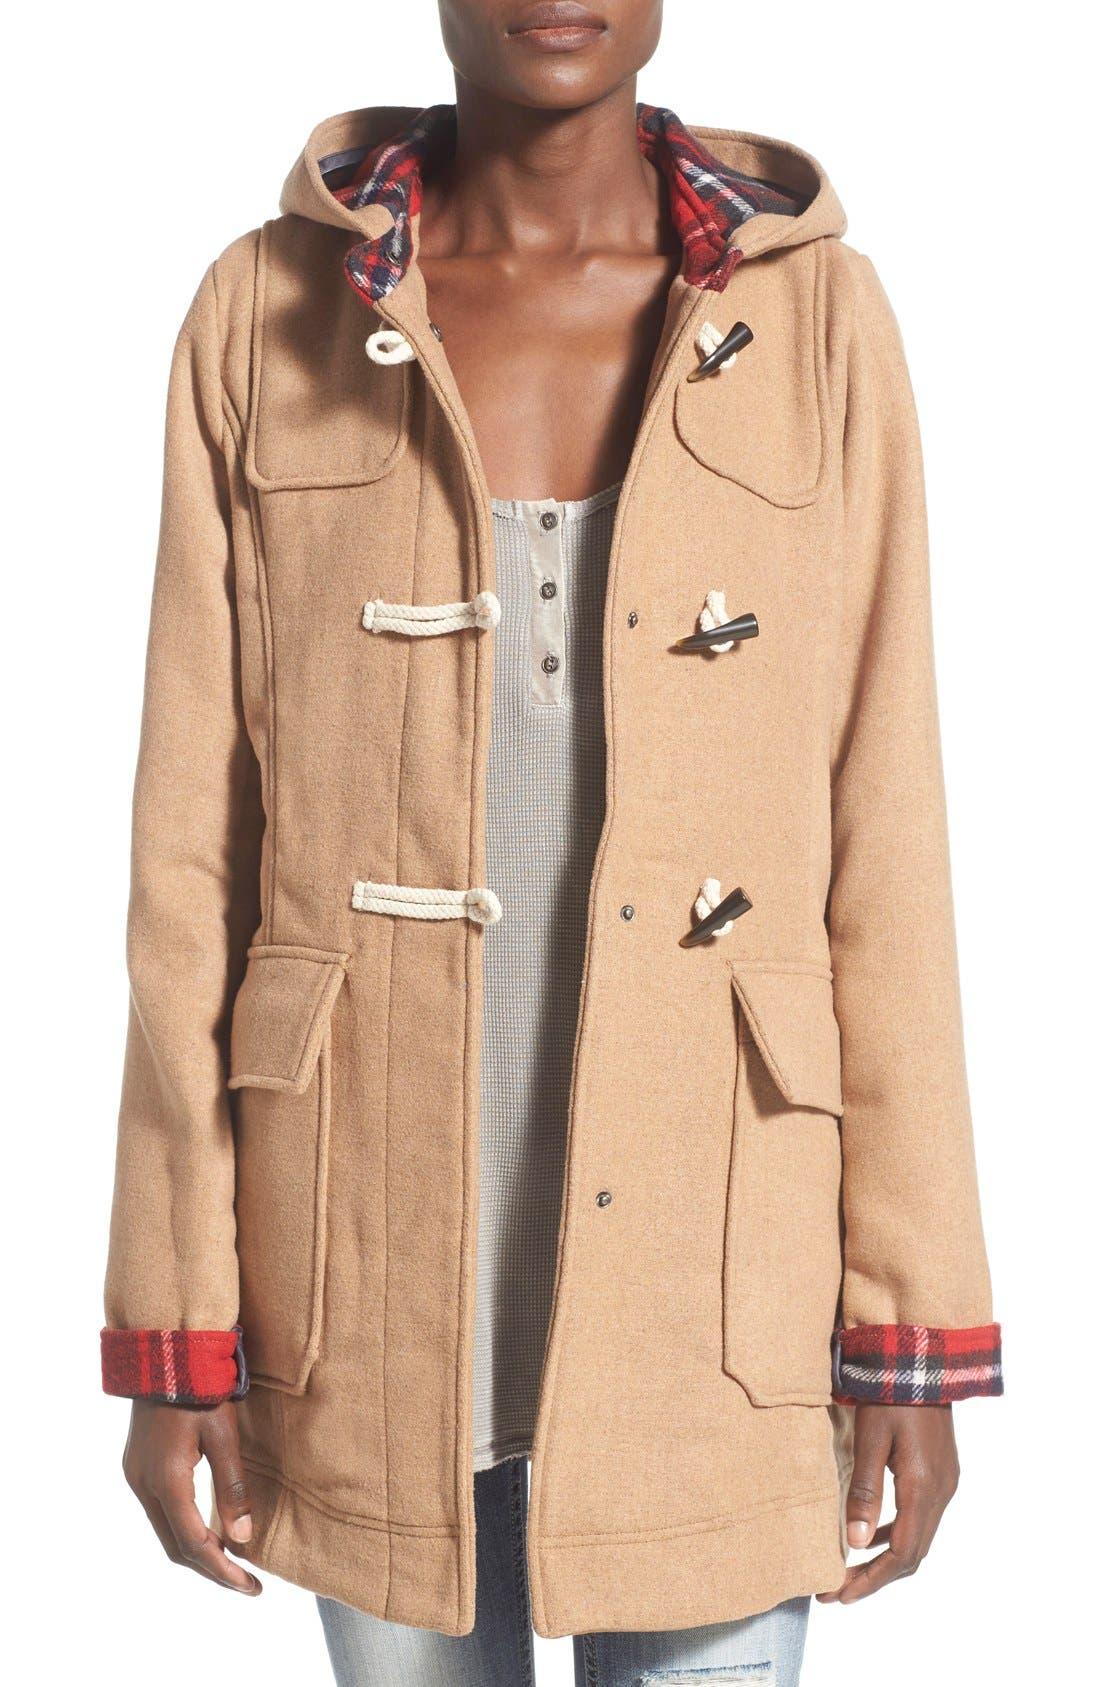 THREAD & SUPPLY 'Waldorf' Toggle Jacket, Main, color, 261